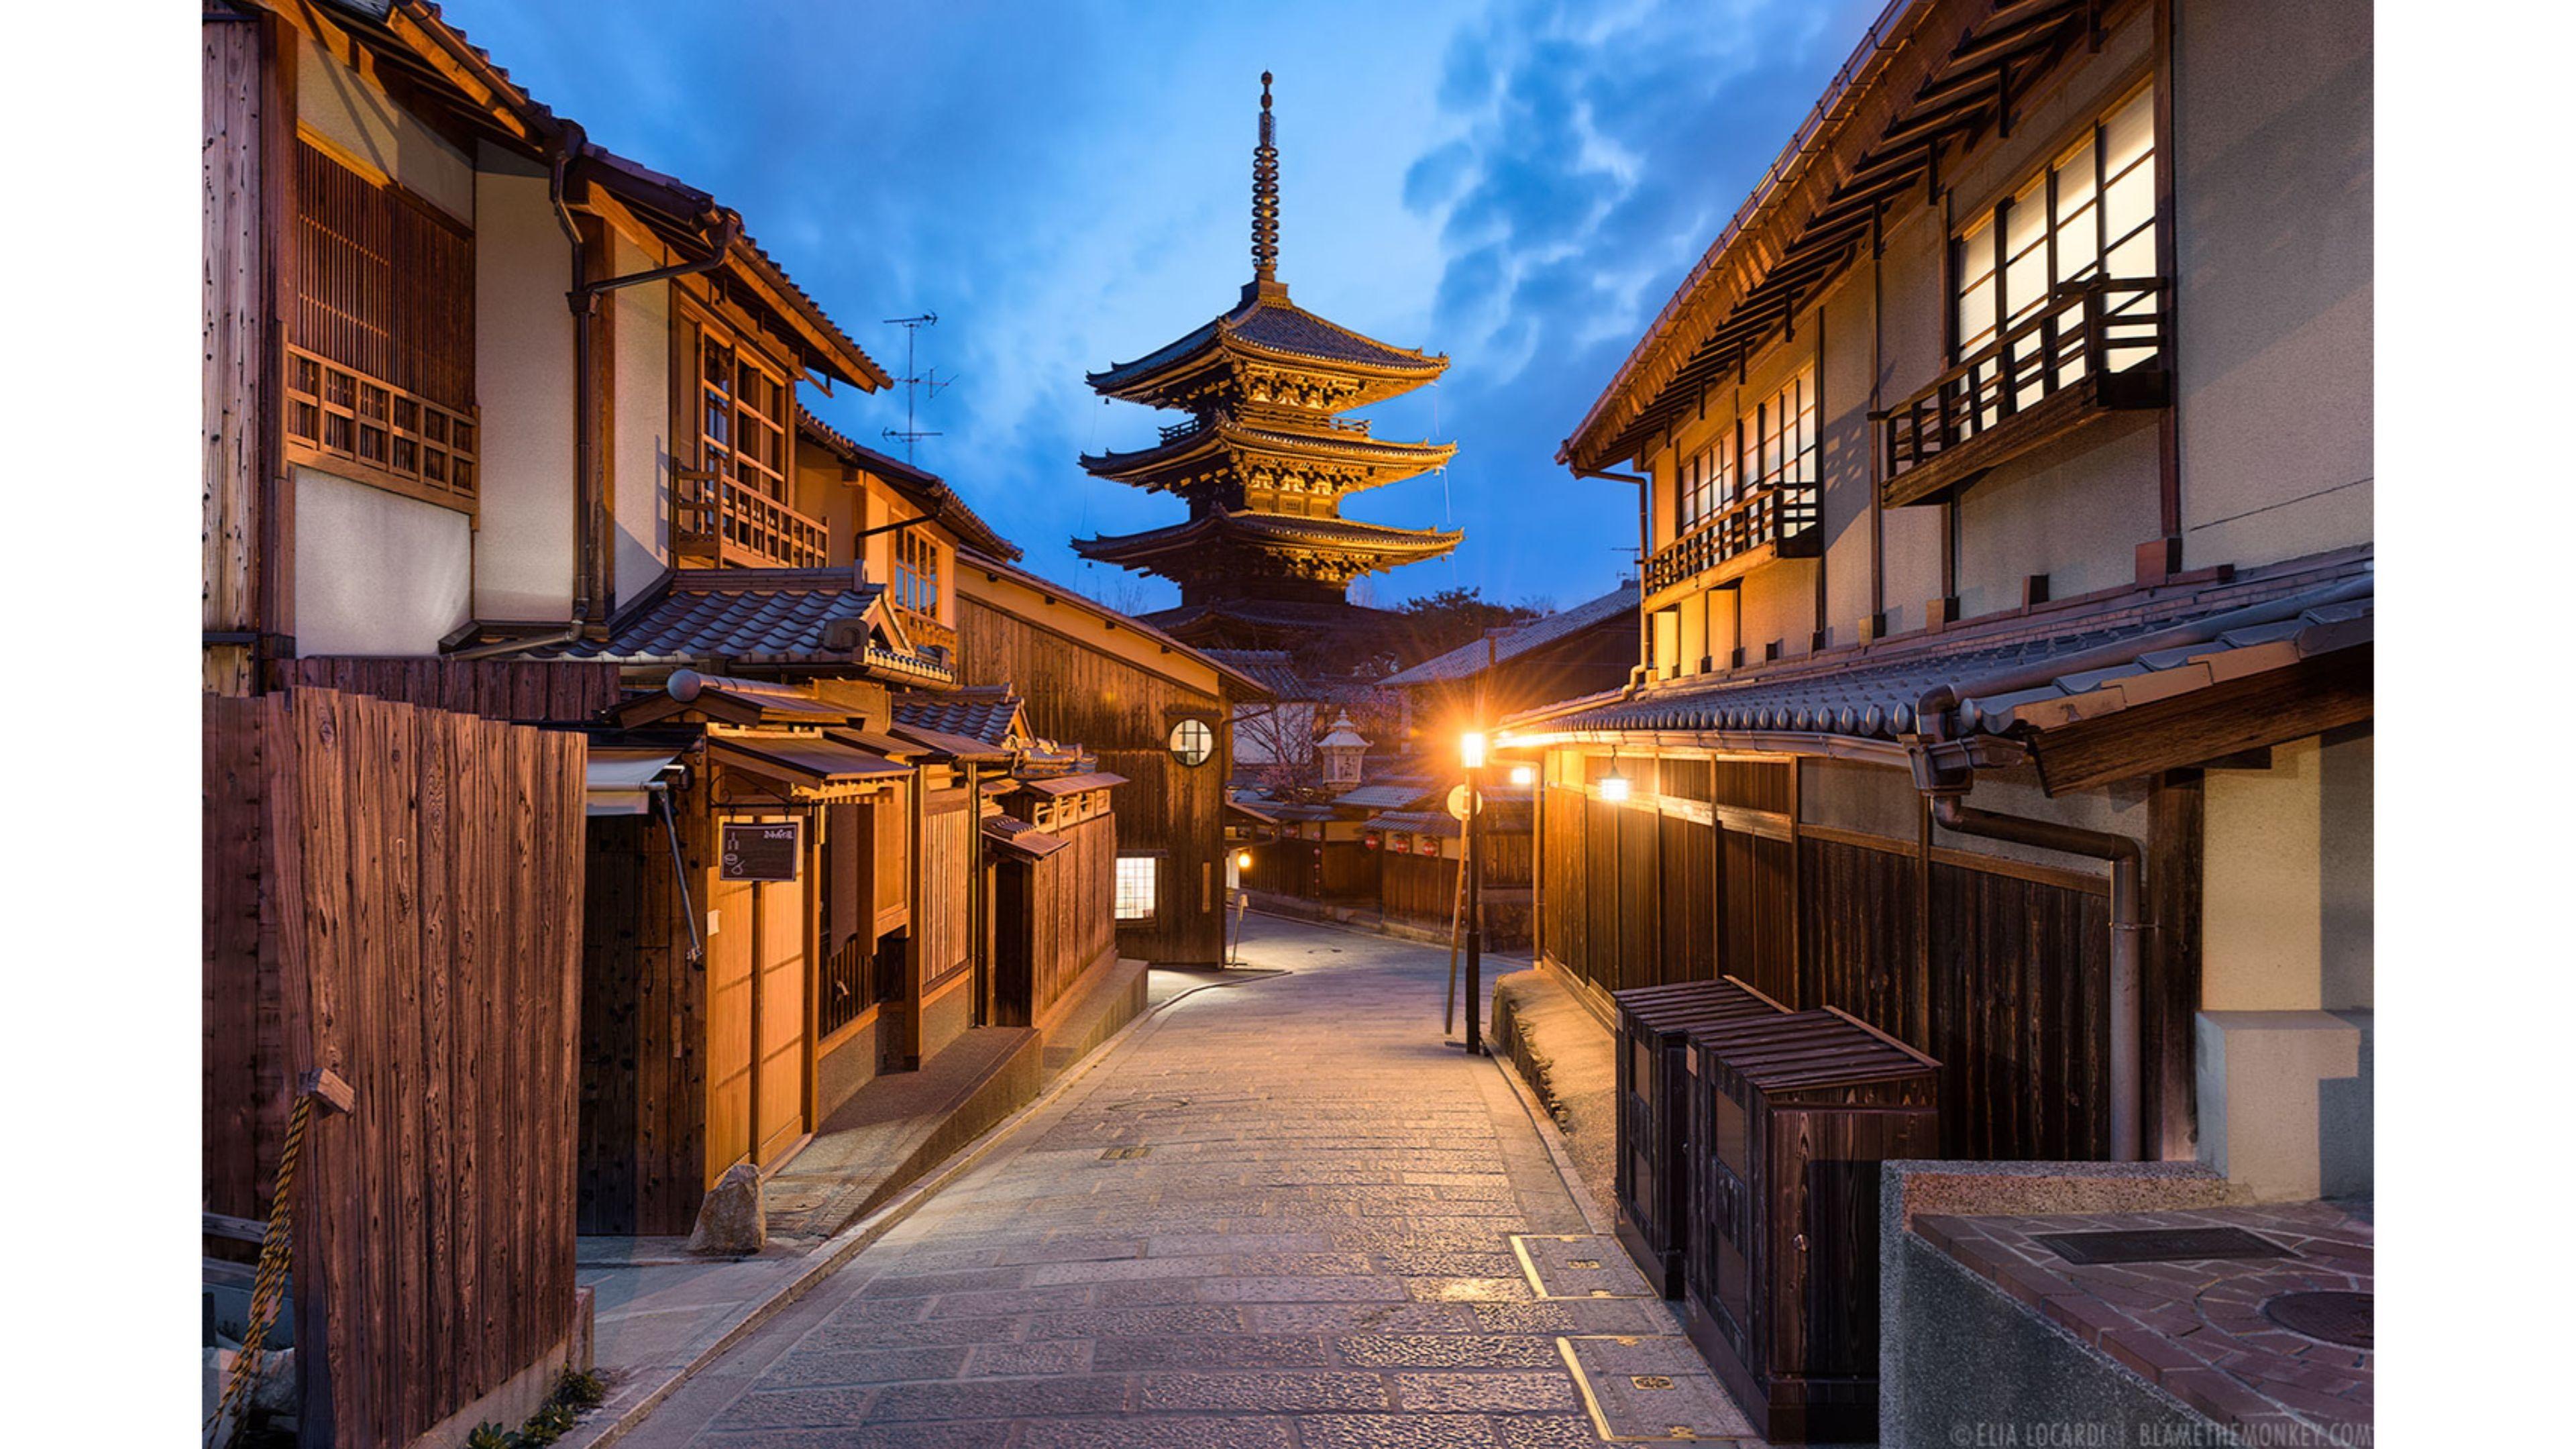 3840x2160 Free Kyoto Japan 4k Wallpaper Japan Travel Kyoto Kyoto Japan